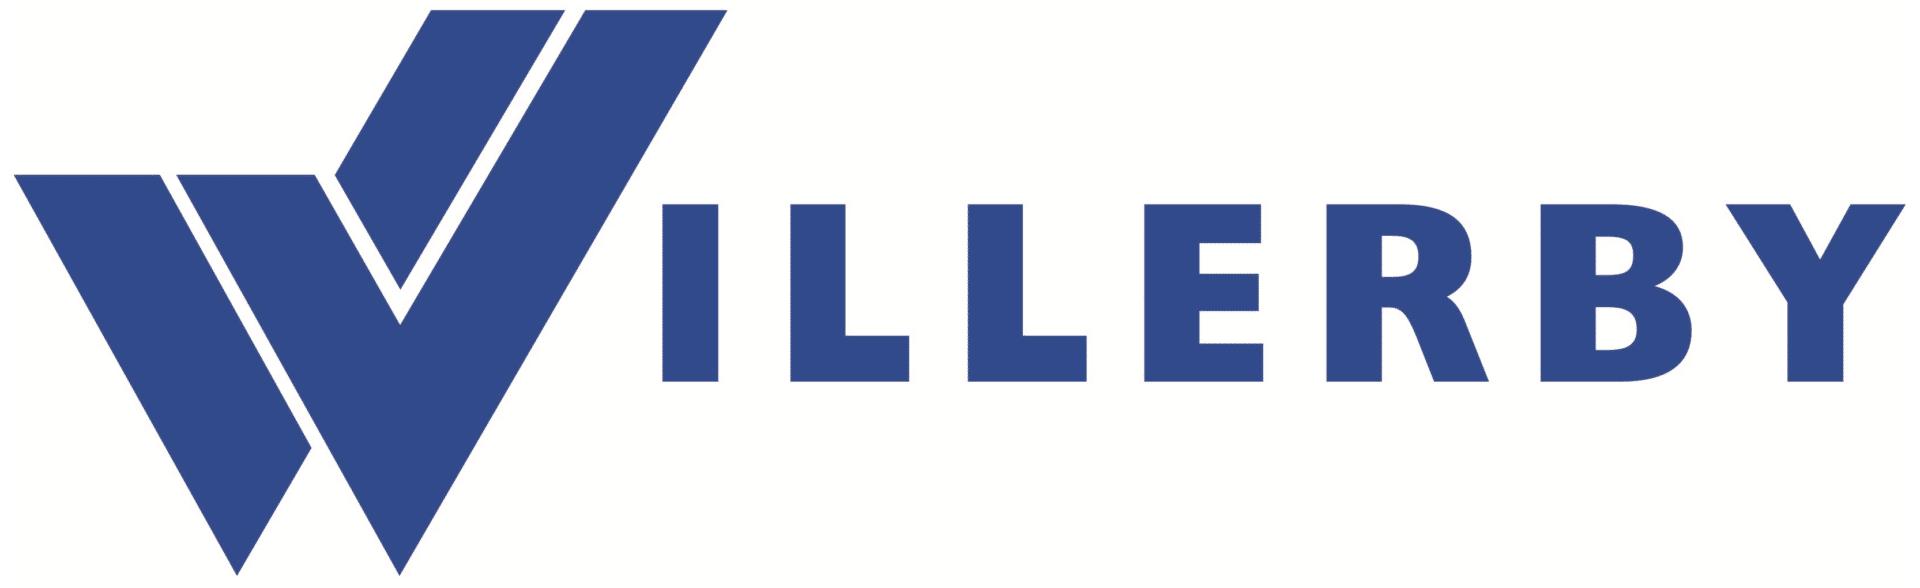 logo willerby mobil home anglais